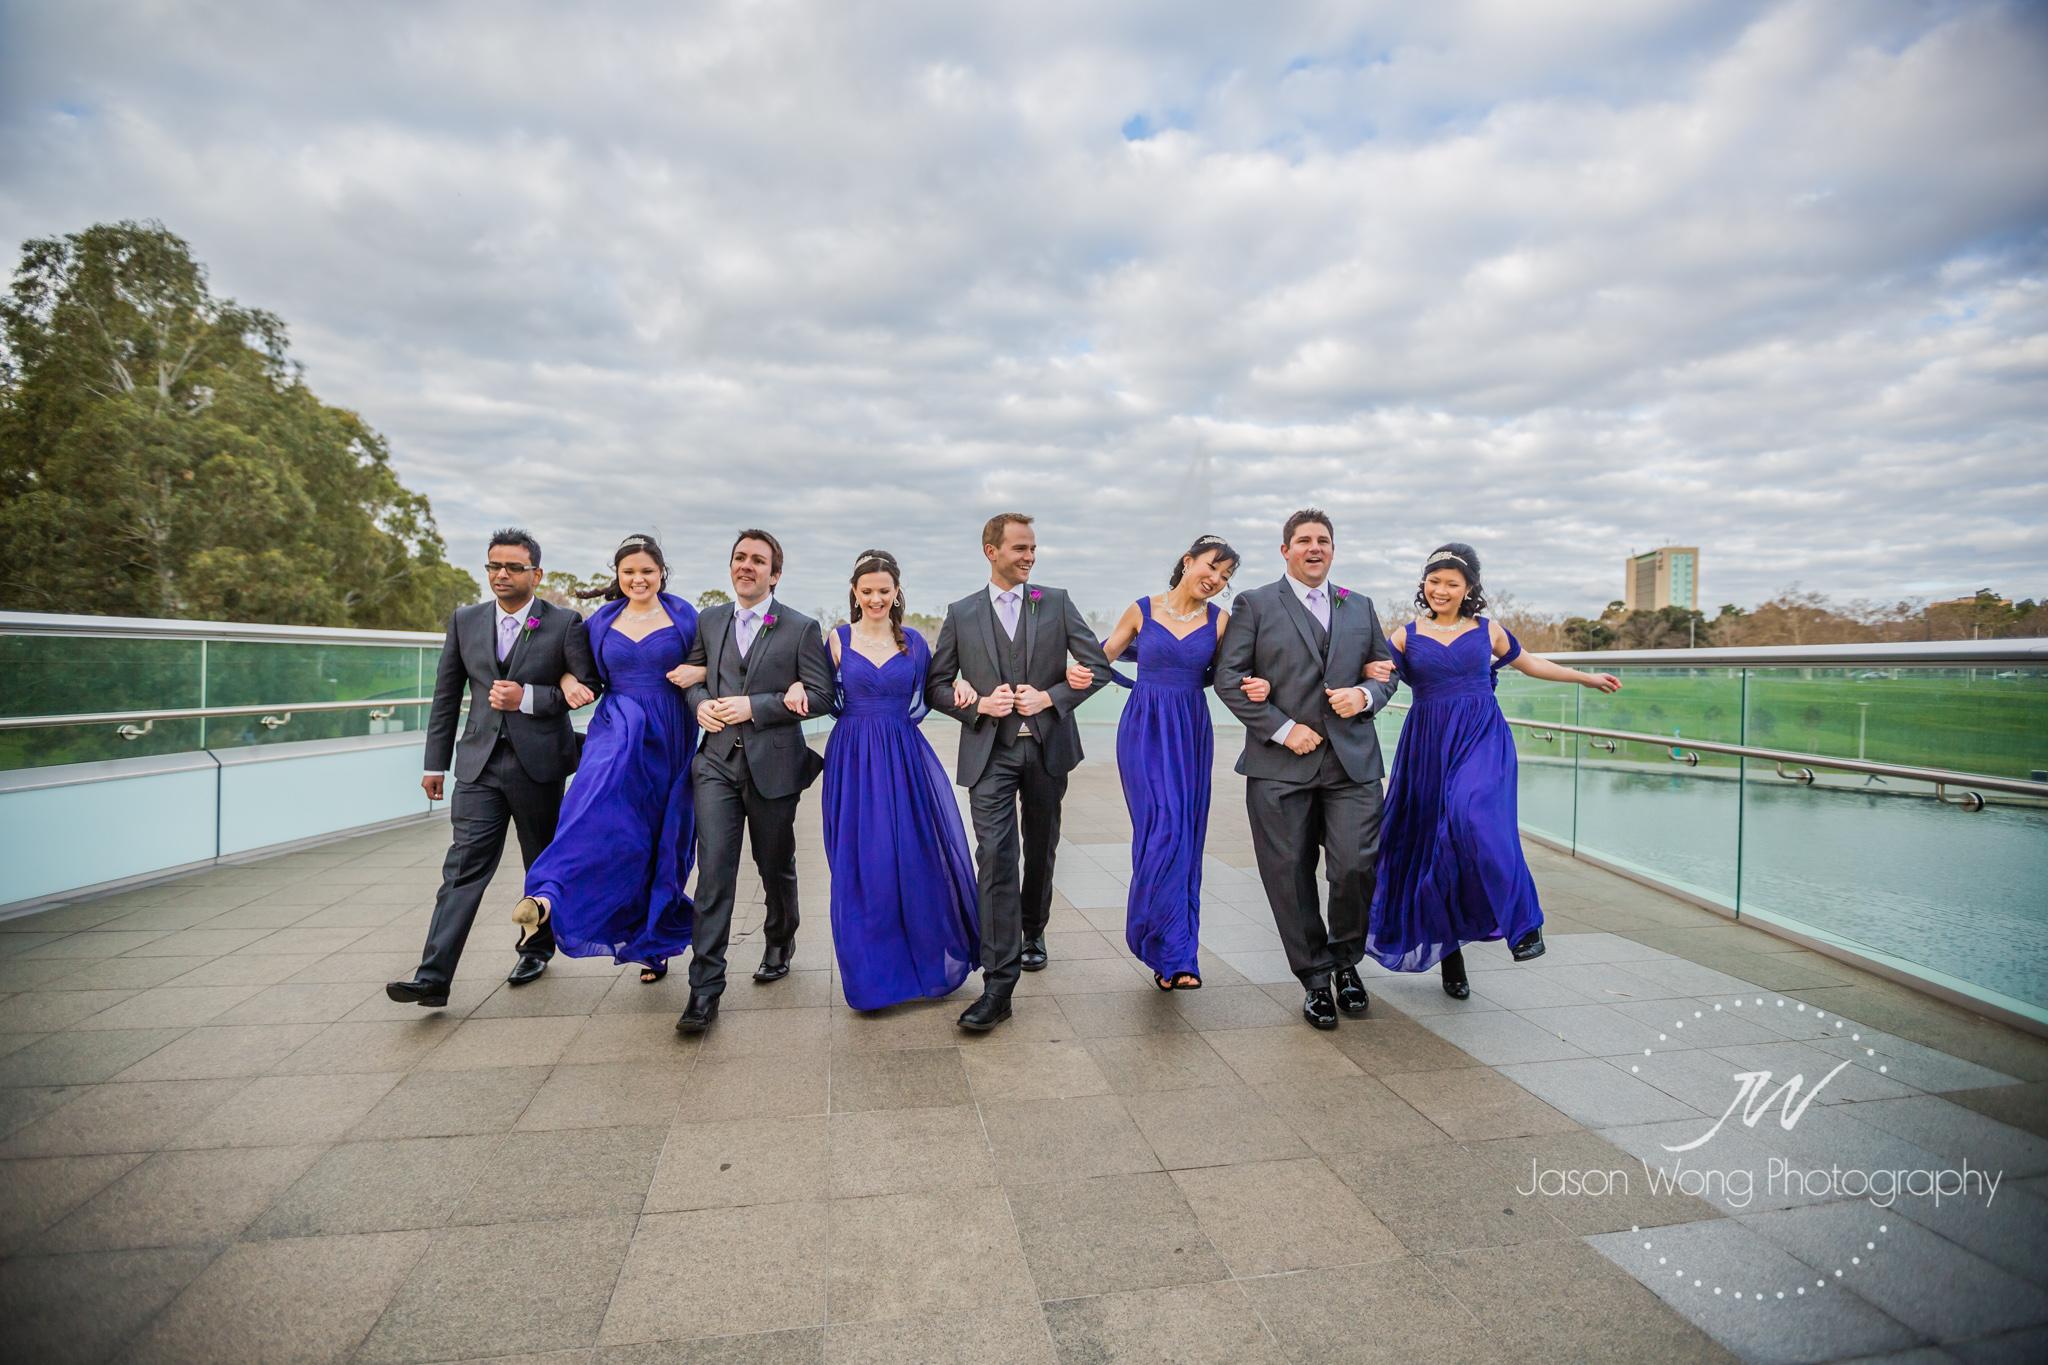 bridalparty-walking-happily.jpg